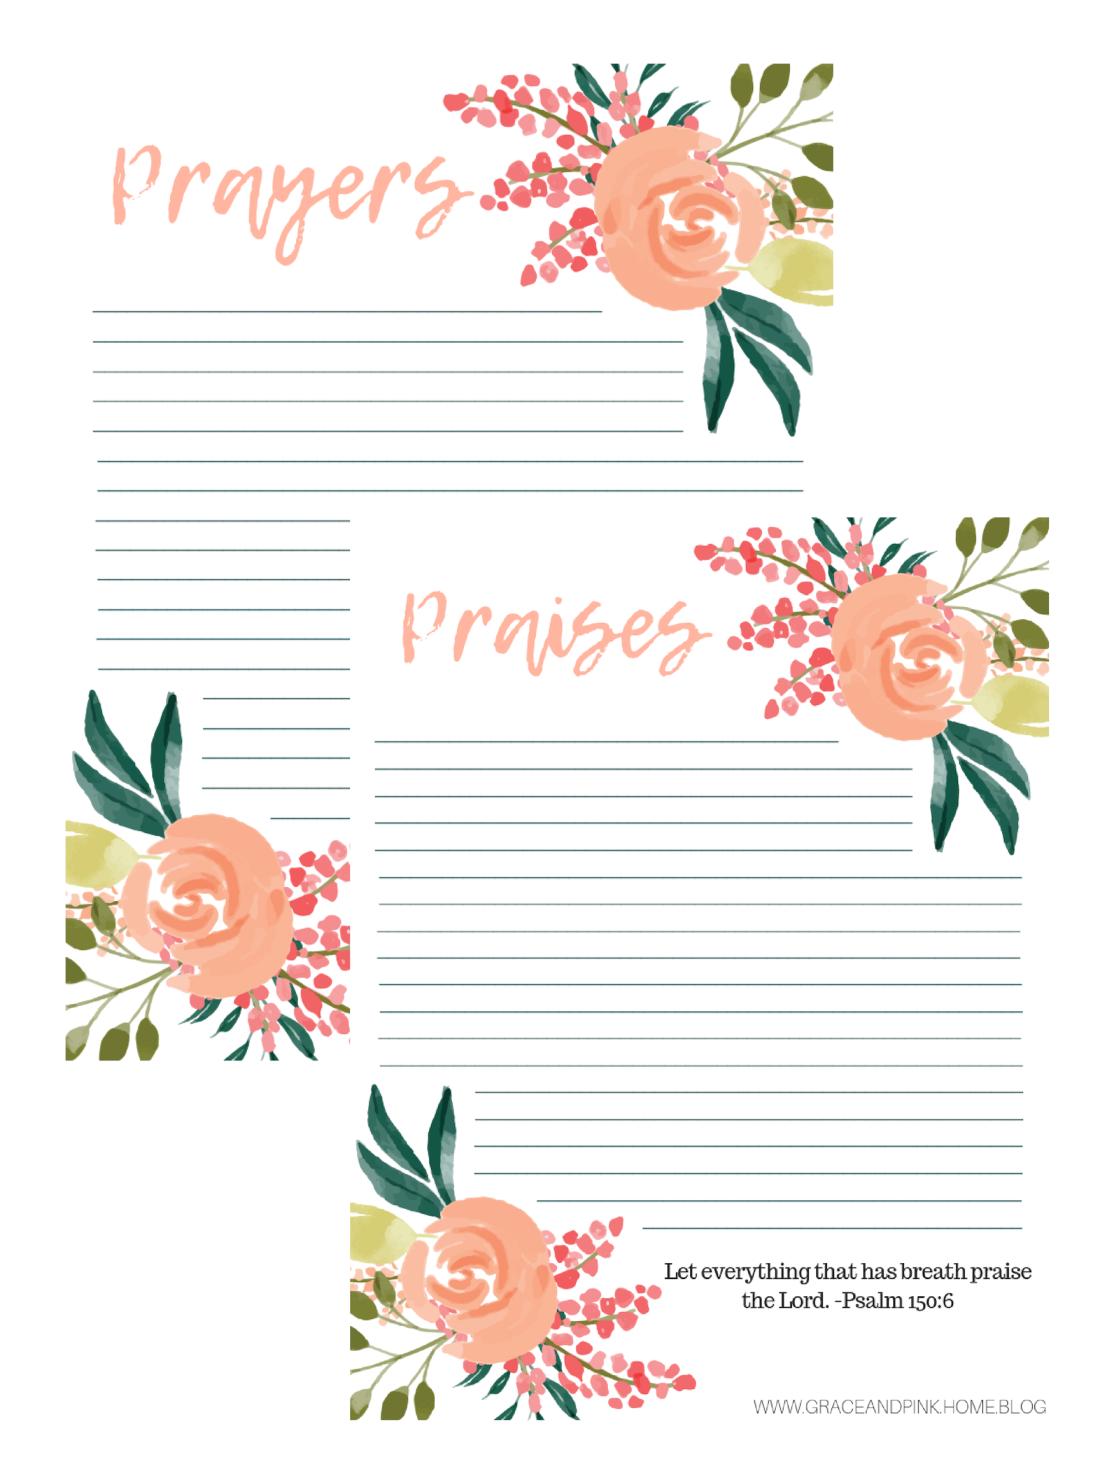 Prayer_Praise Worksheet (1)